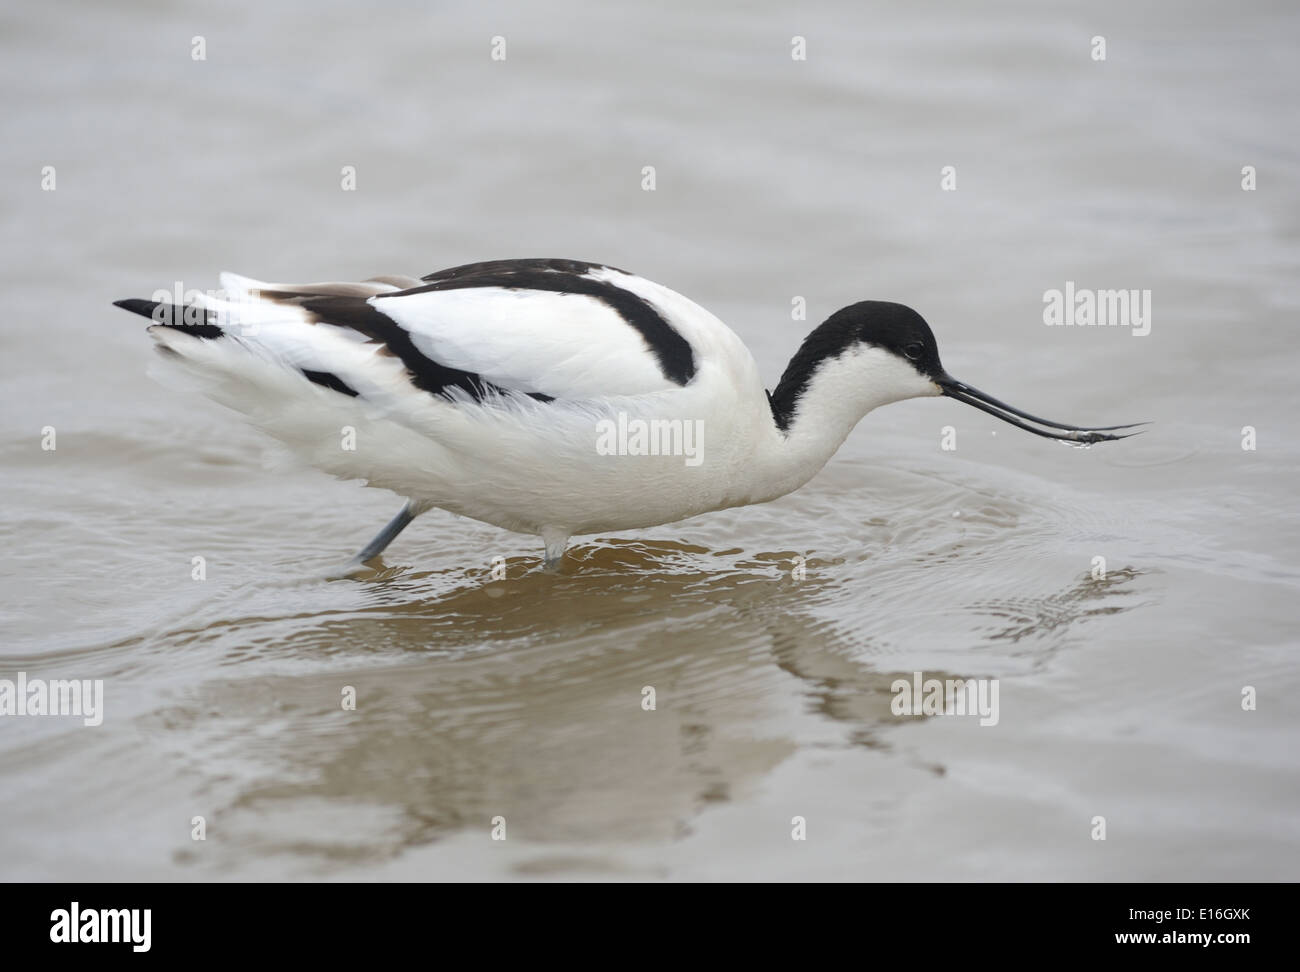 An Avocet (Recurvirostra avosetta) feeding in shallow water. Cley, Norfolk. - Stock Image